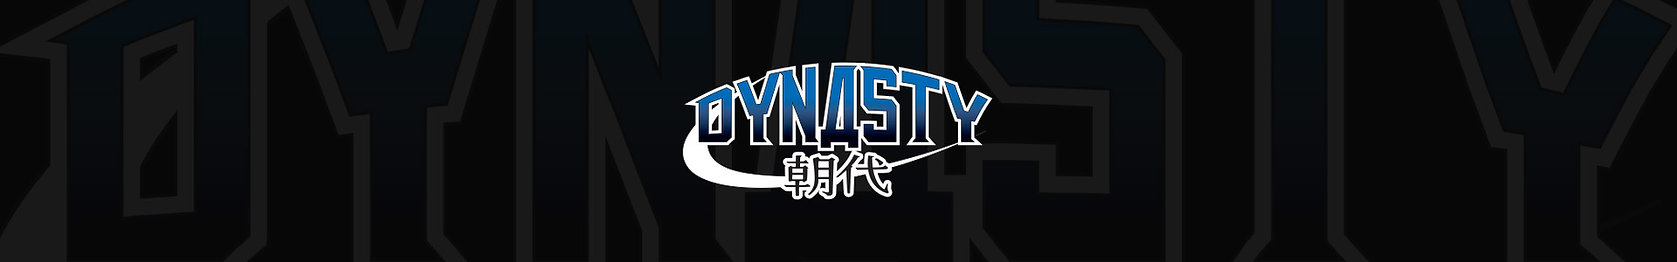 LogoBar_SanDiegoDynasty.jpg